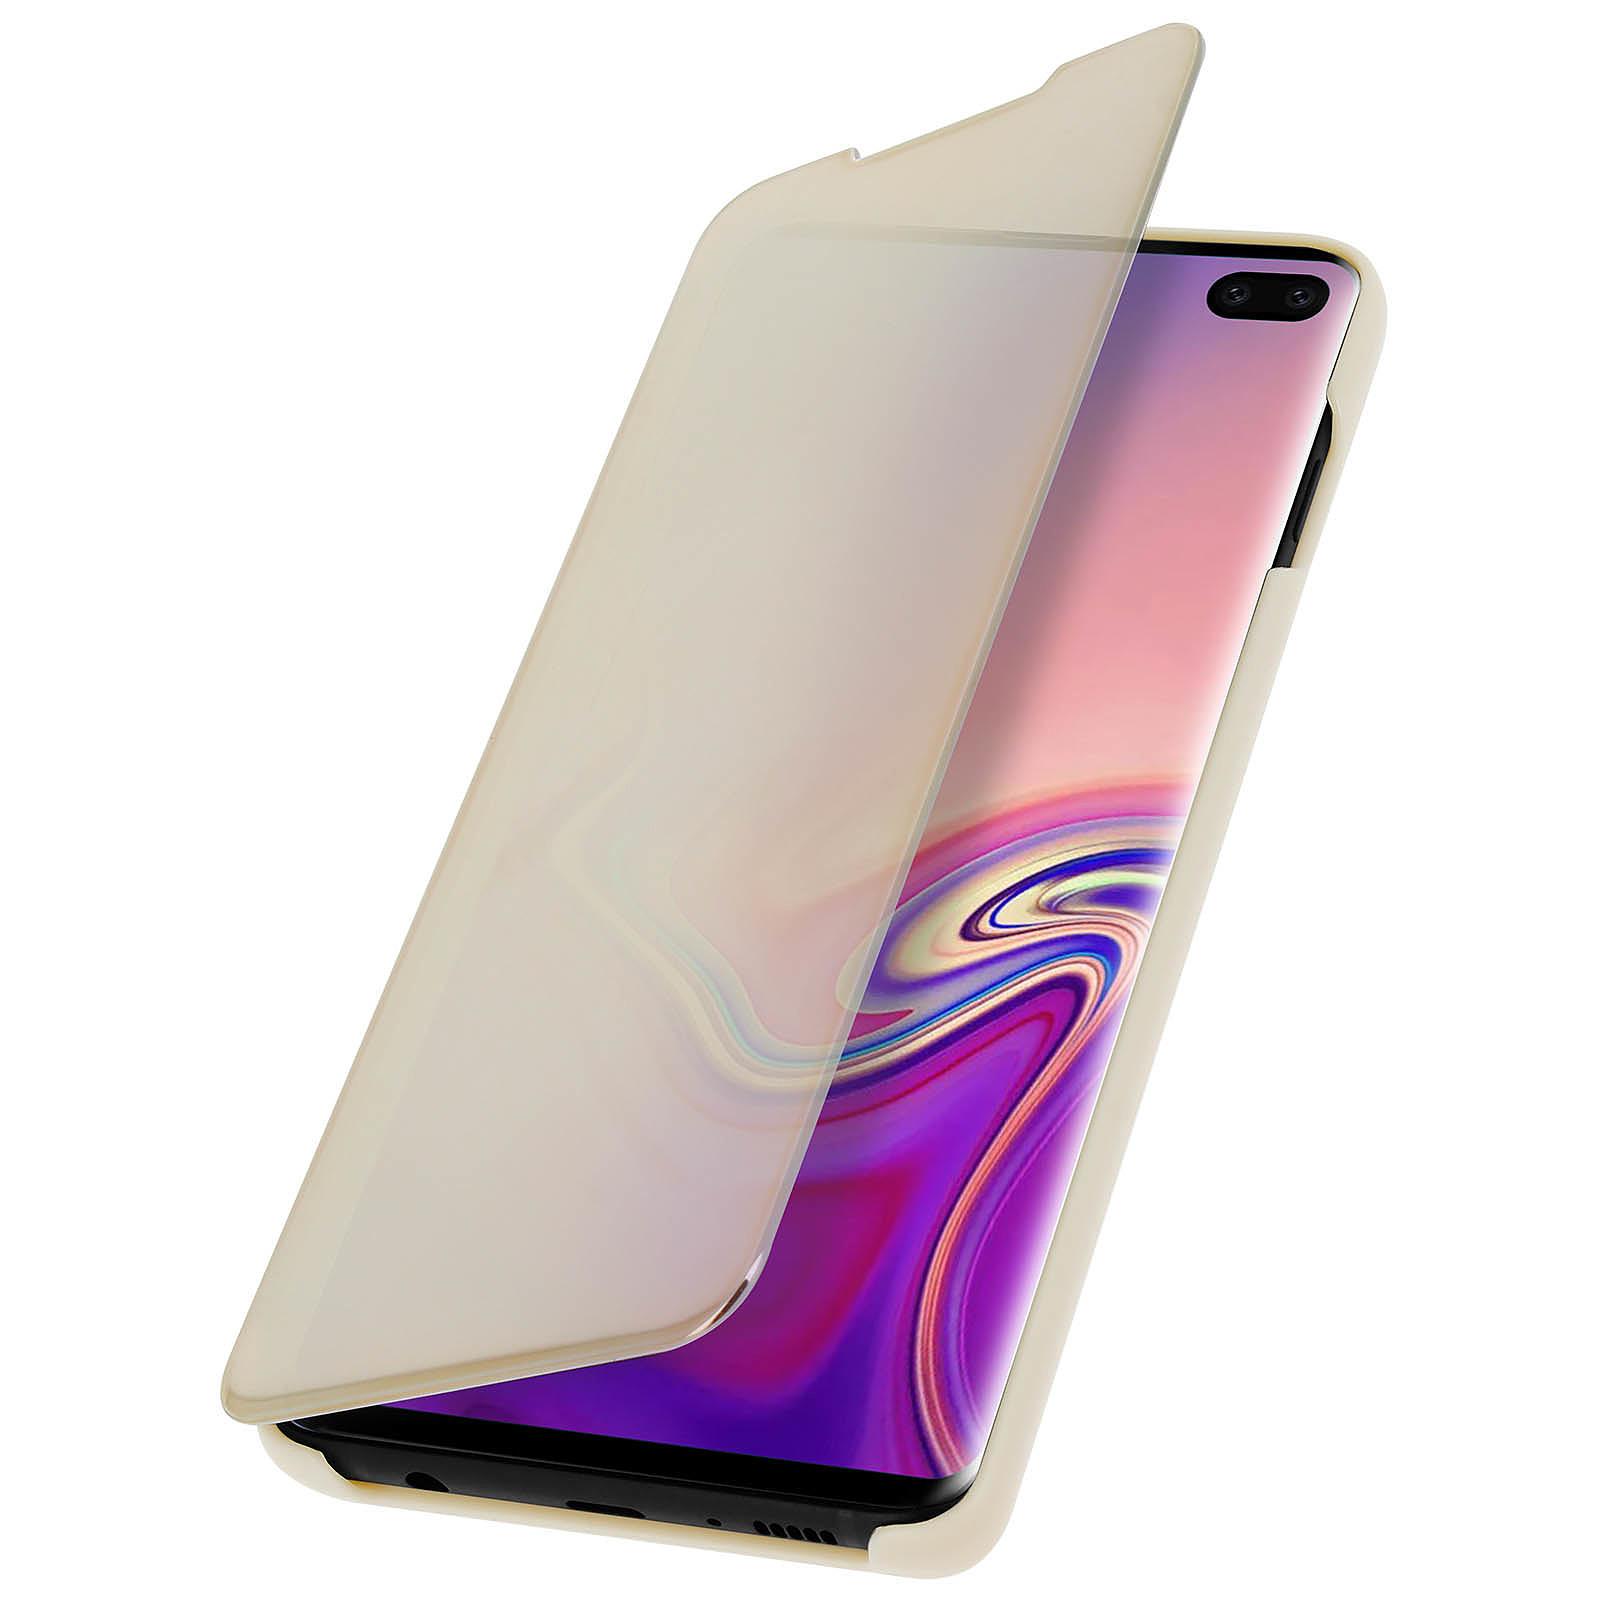 Avizar Etui folio Dorée Design Miroir pour Samsung Galaxy S10 Plus